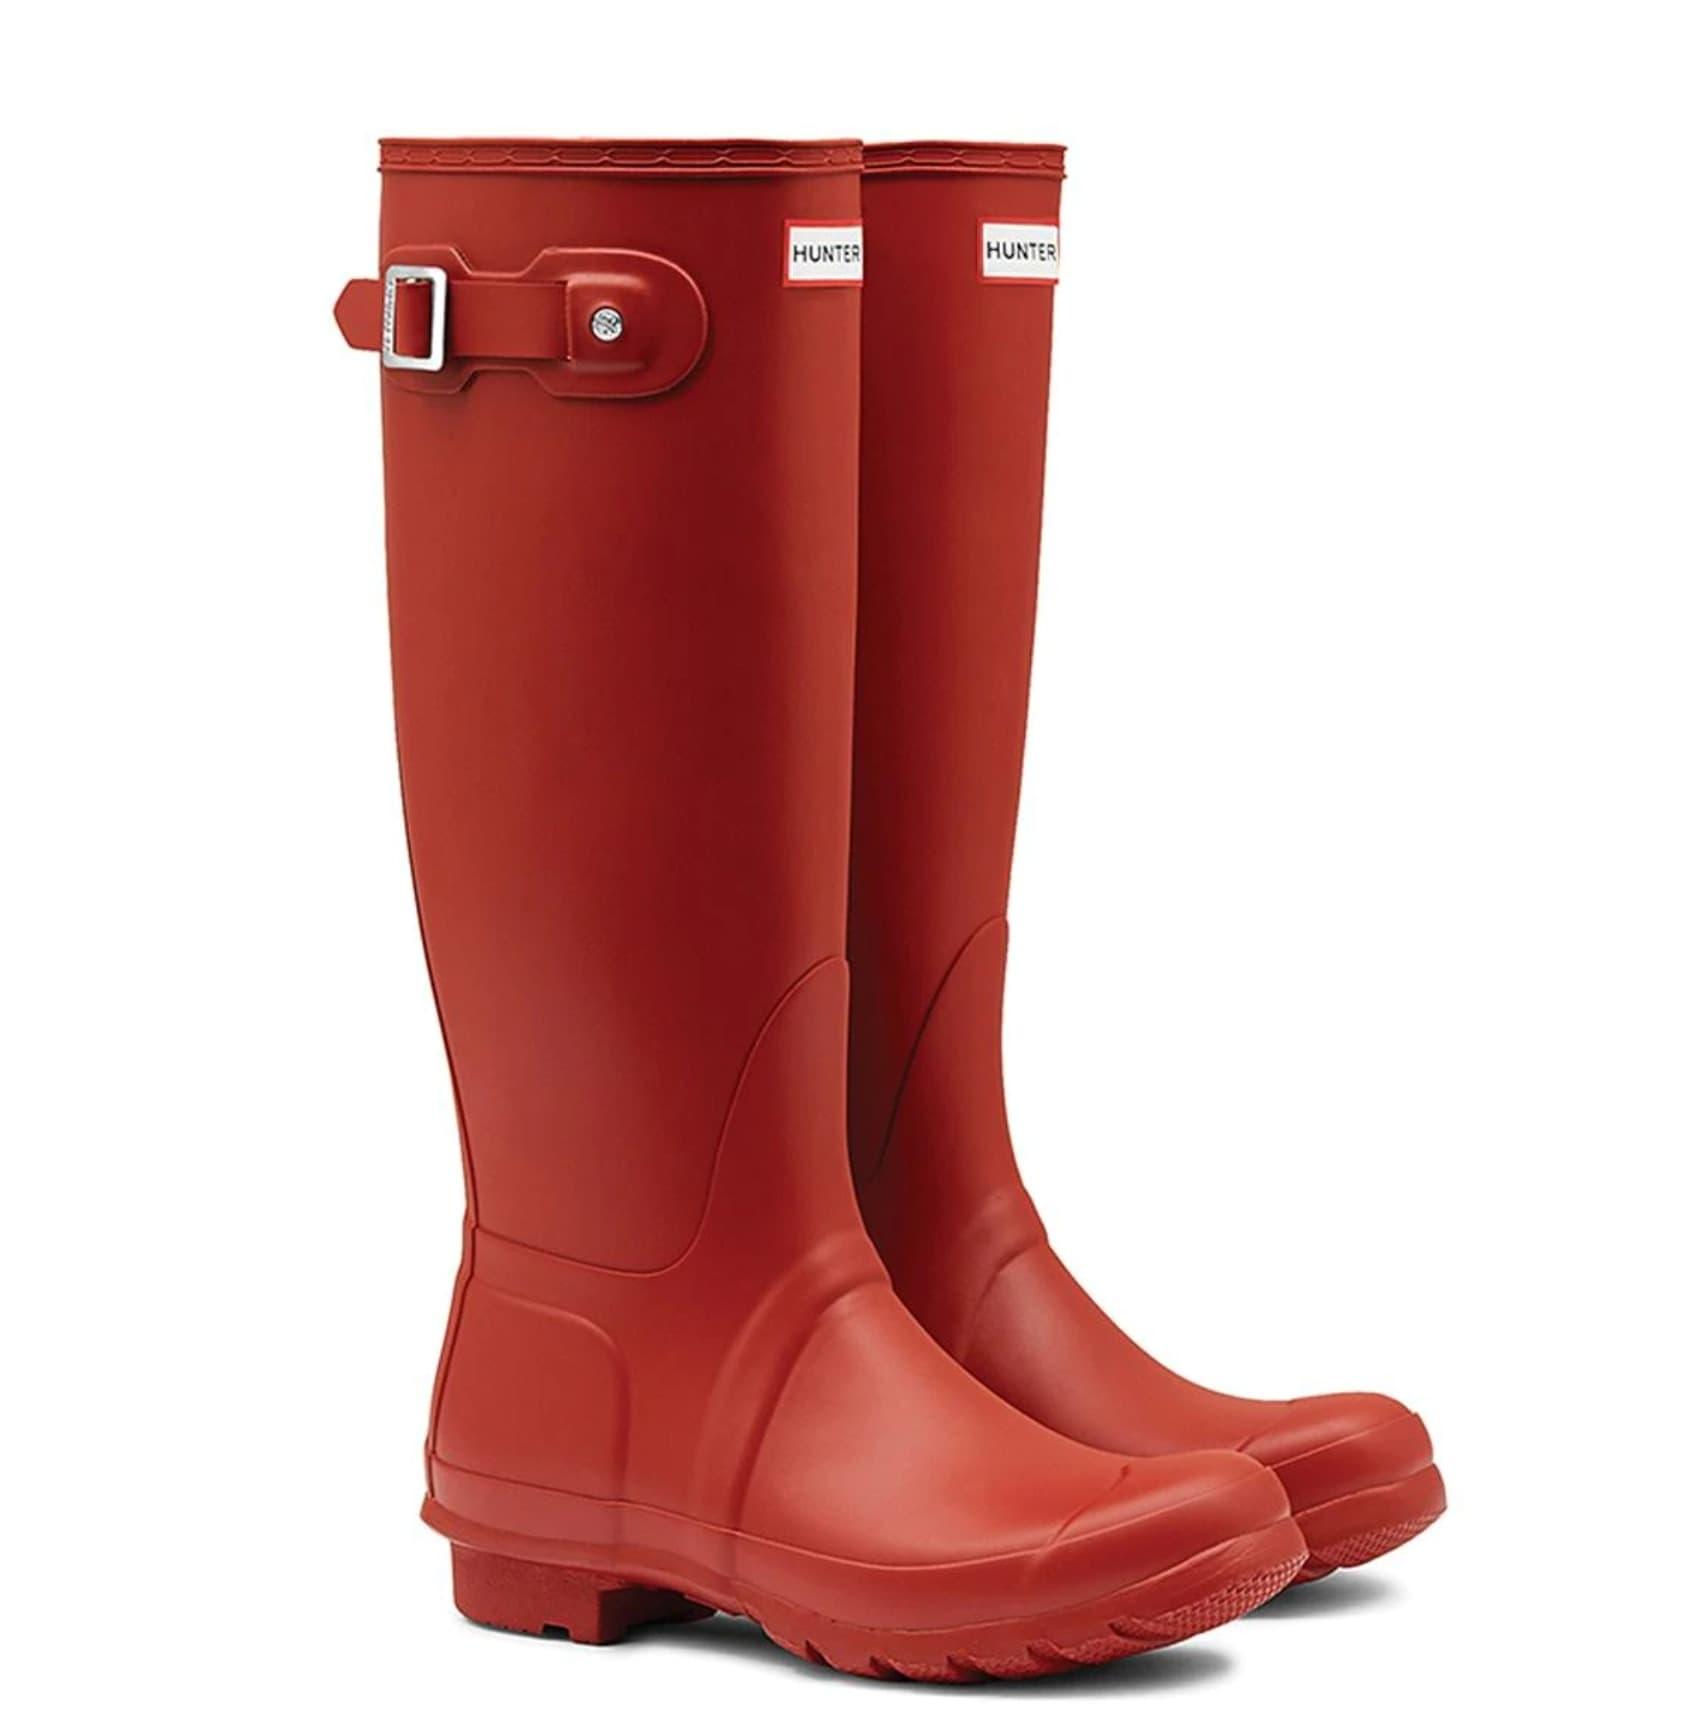 Botas de agua de mujer Hunter en rojo de caña alta